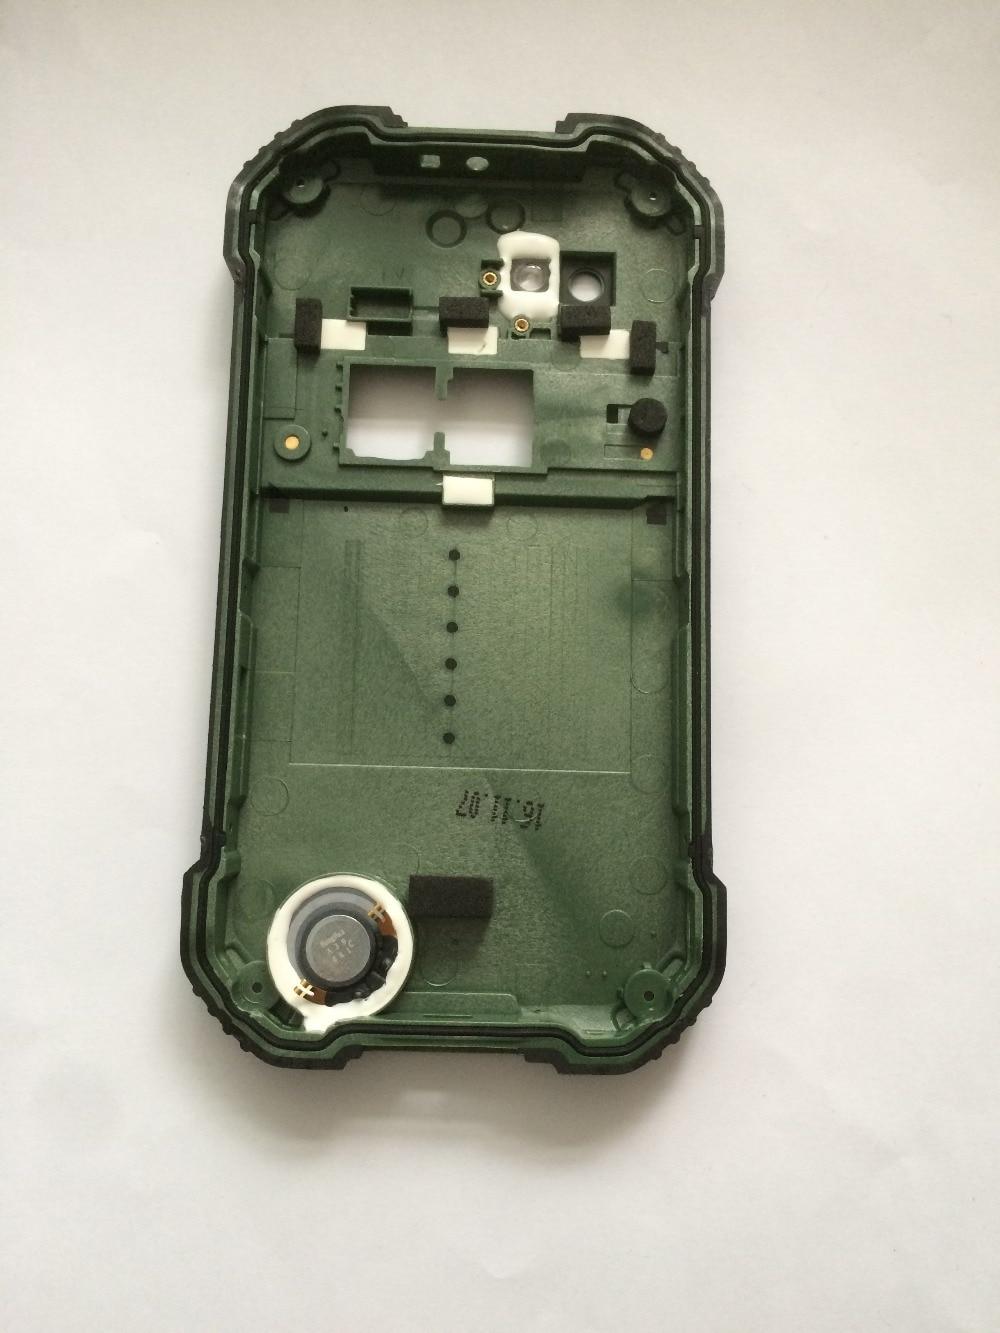 Image 5 - New Blackview BV6000 Battery Cover Back Shell+Loud Speaker For Blackview BV6000S Phone Free shipping+tracking number-in Mobile Phone Housings & Frames from Cellphones & Telecommunications on